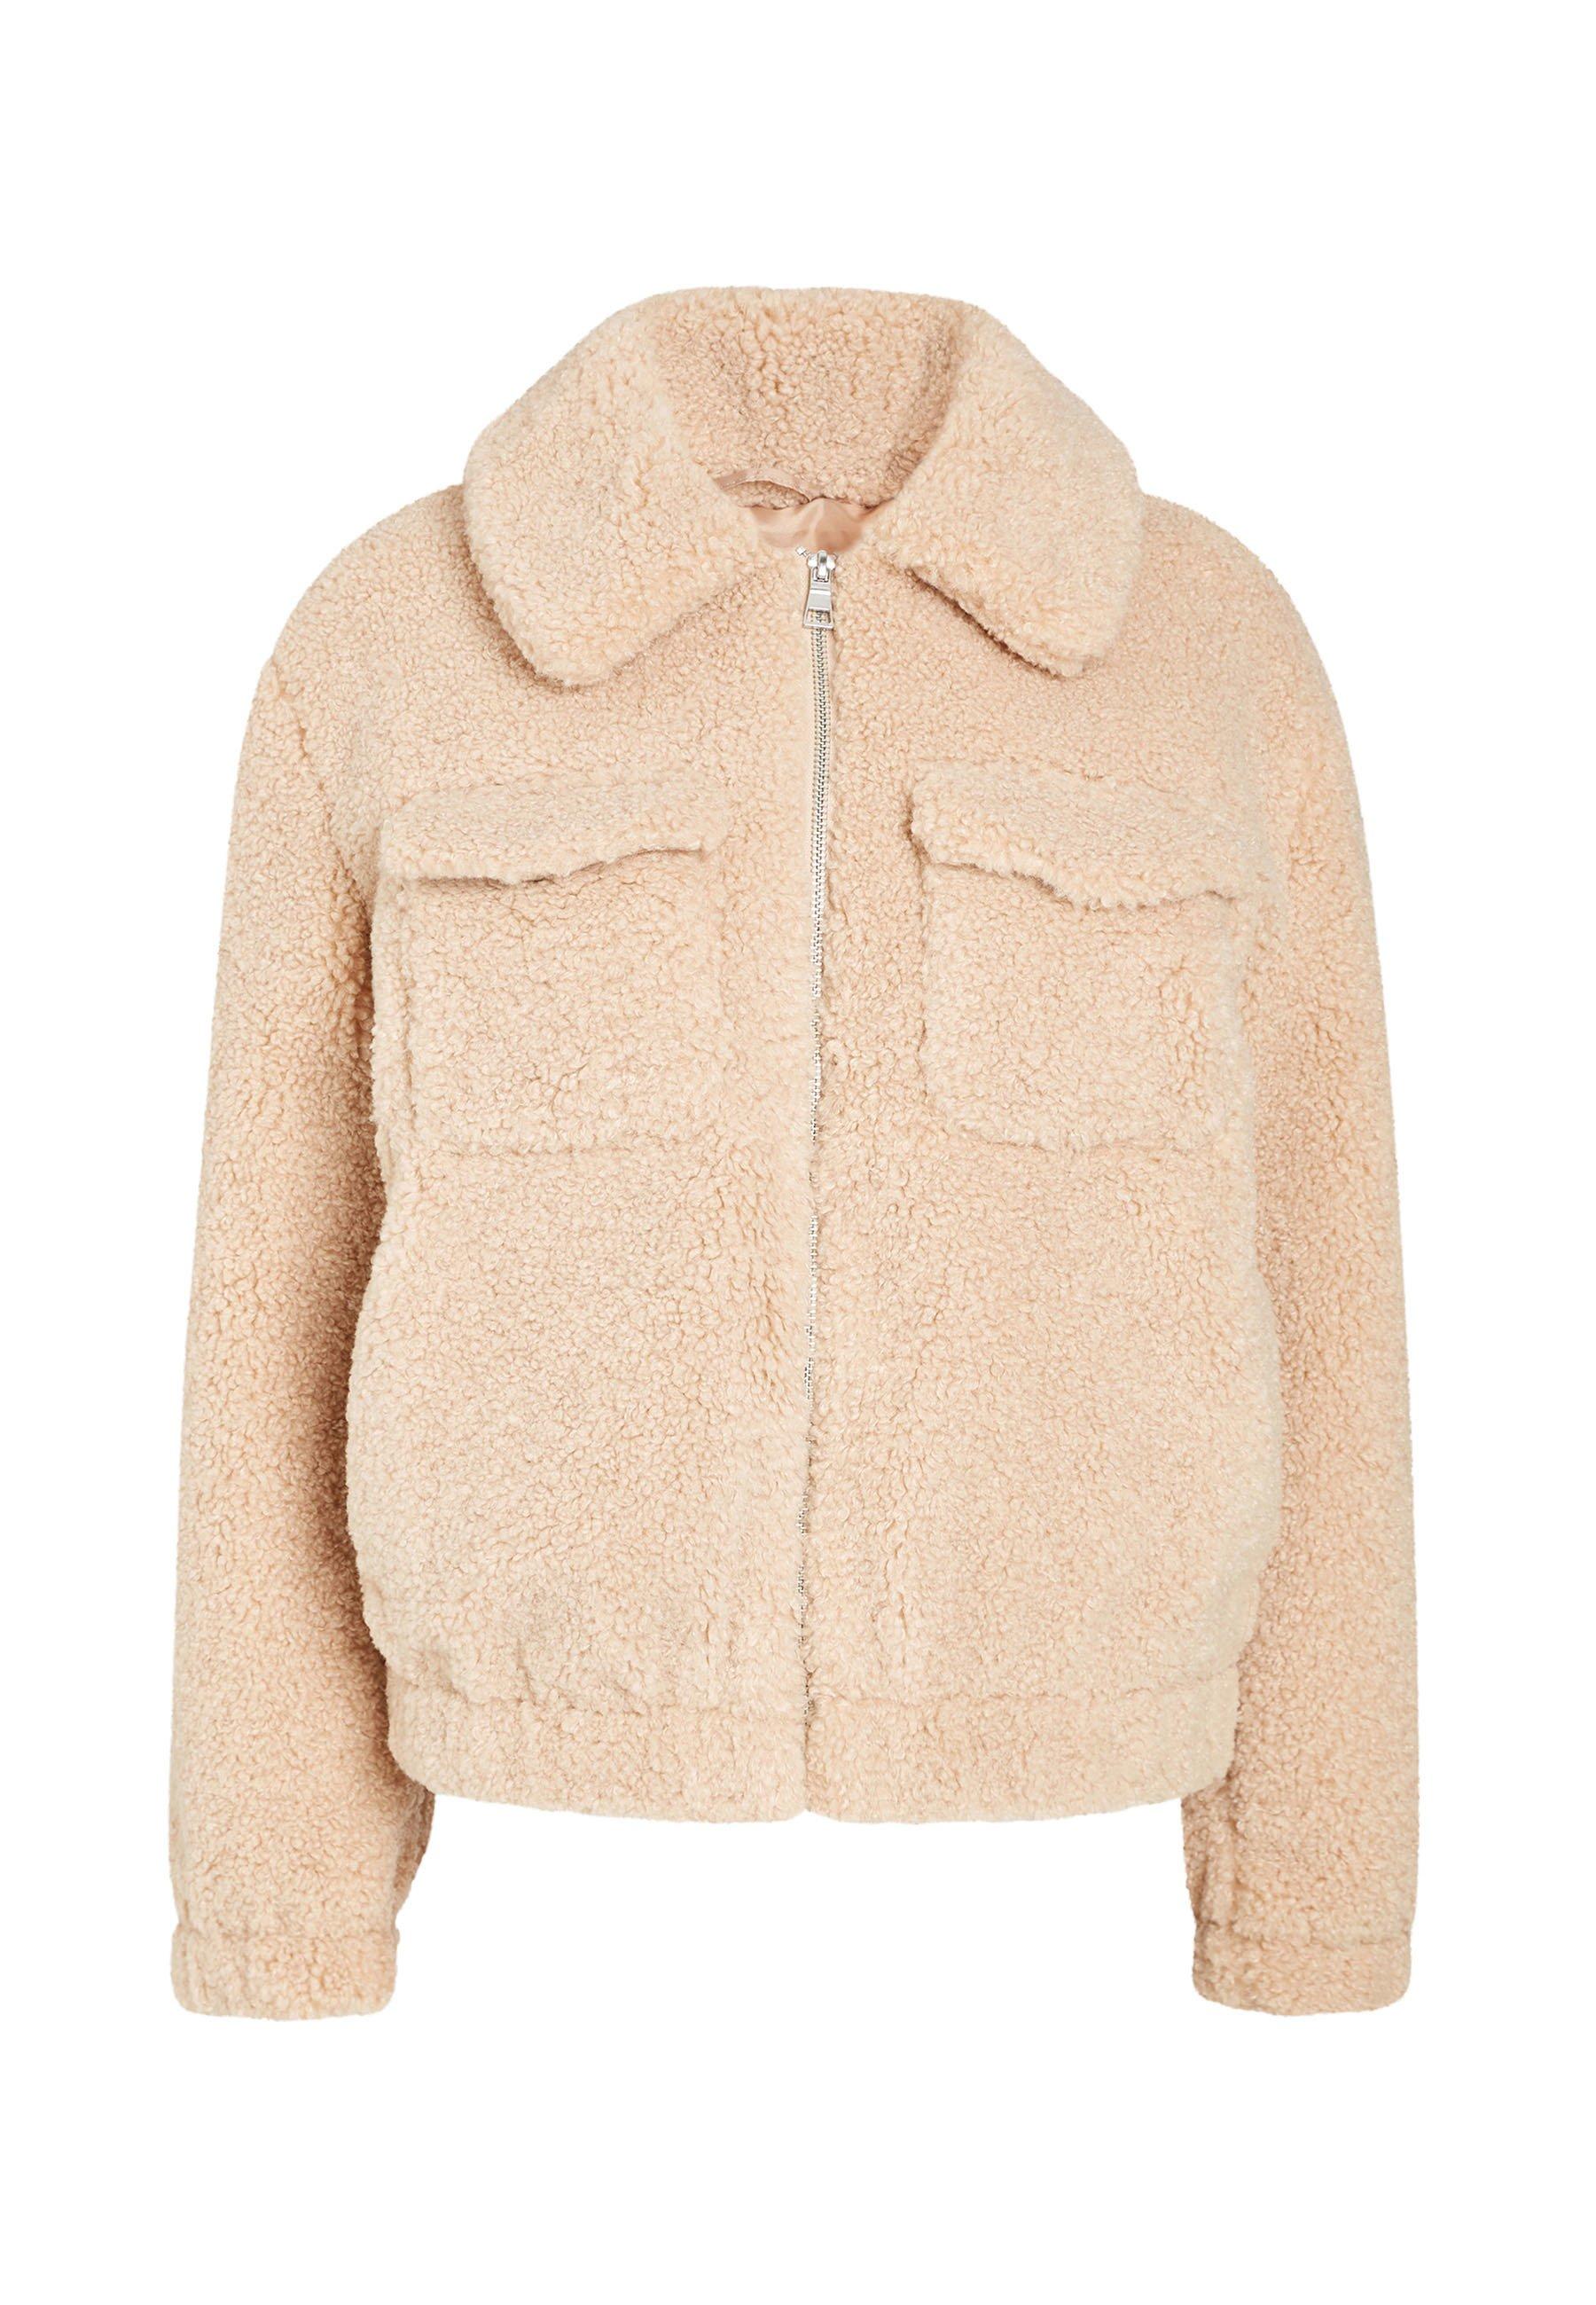 Next Neutral Teddy Borg Western Jacket - Vinterjacka Beige